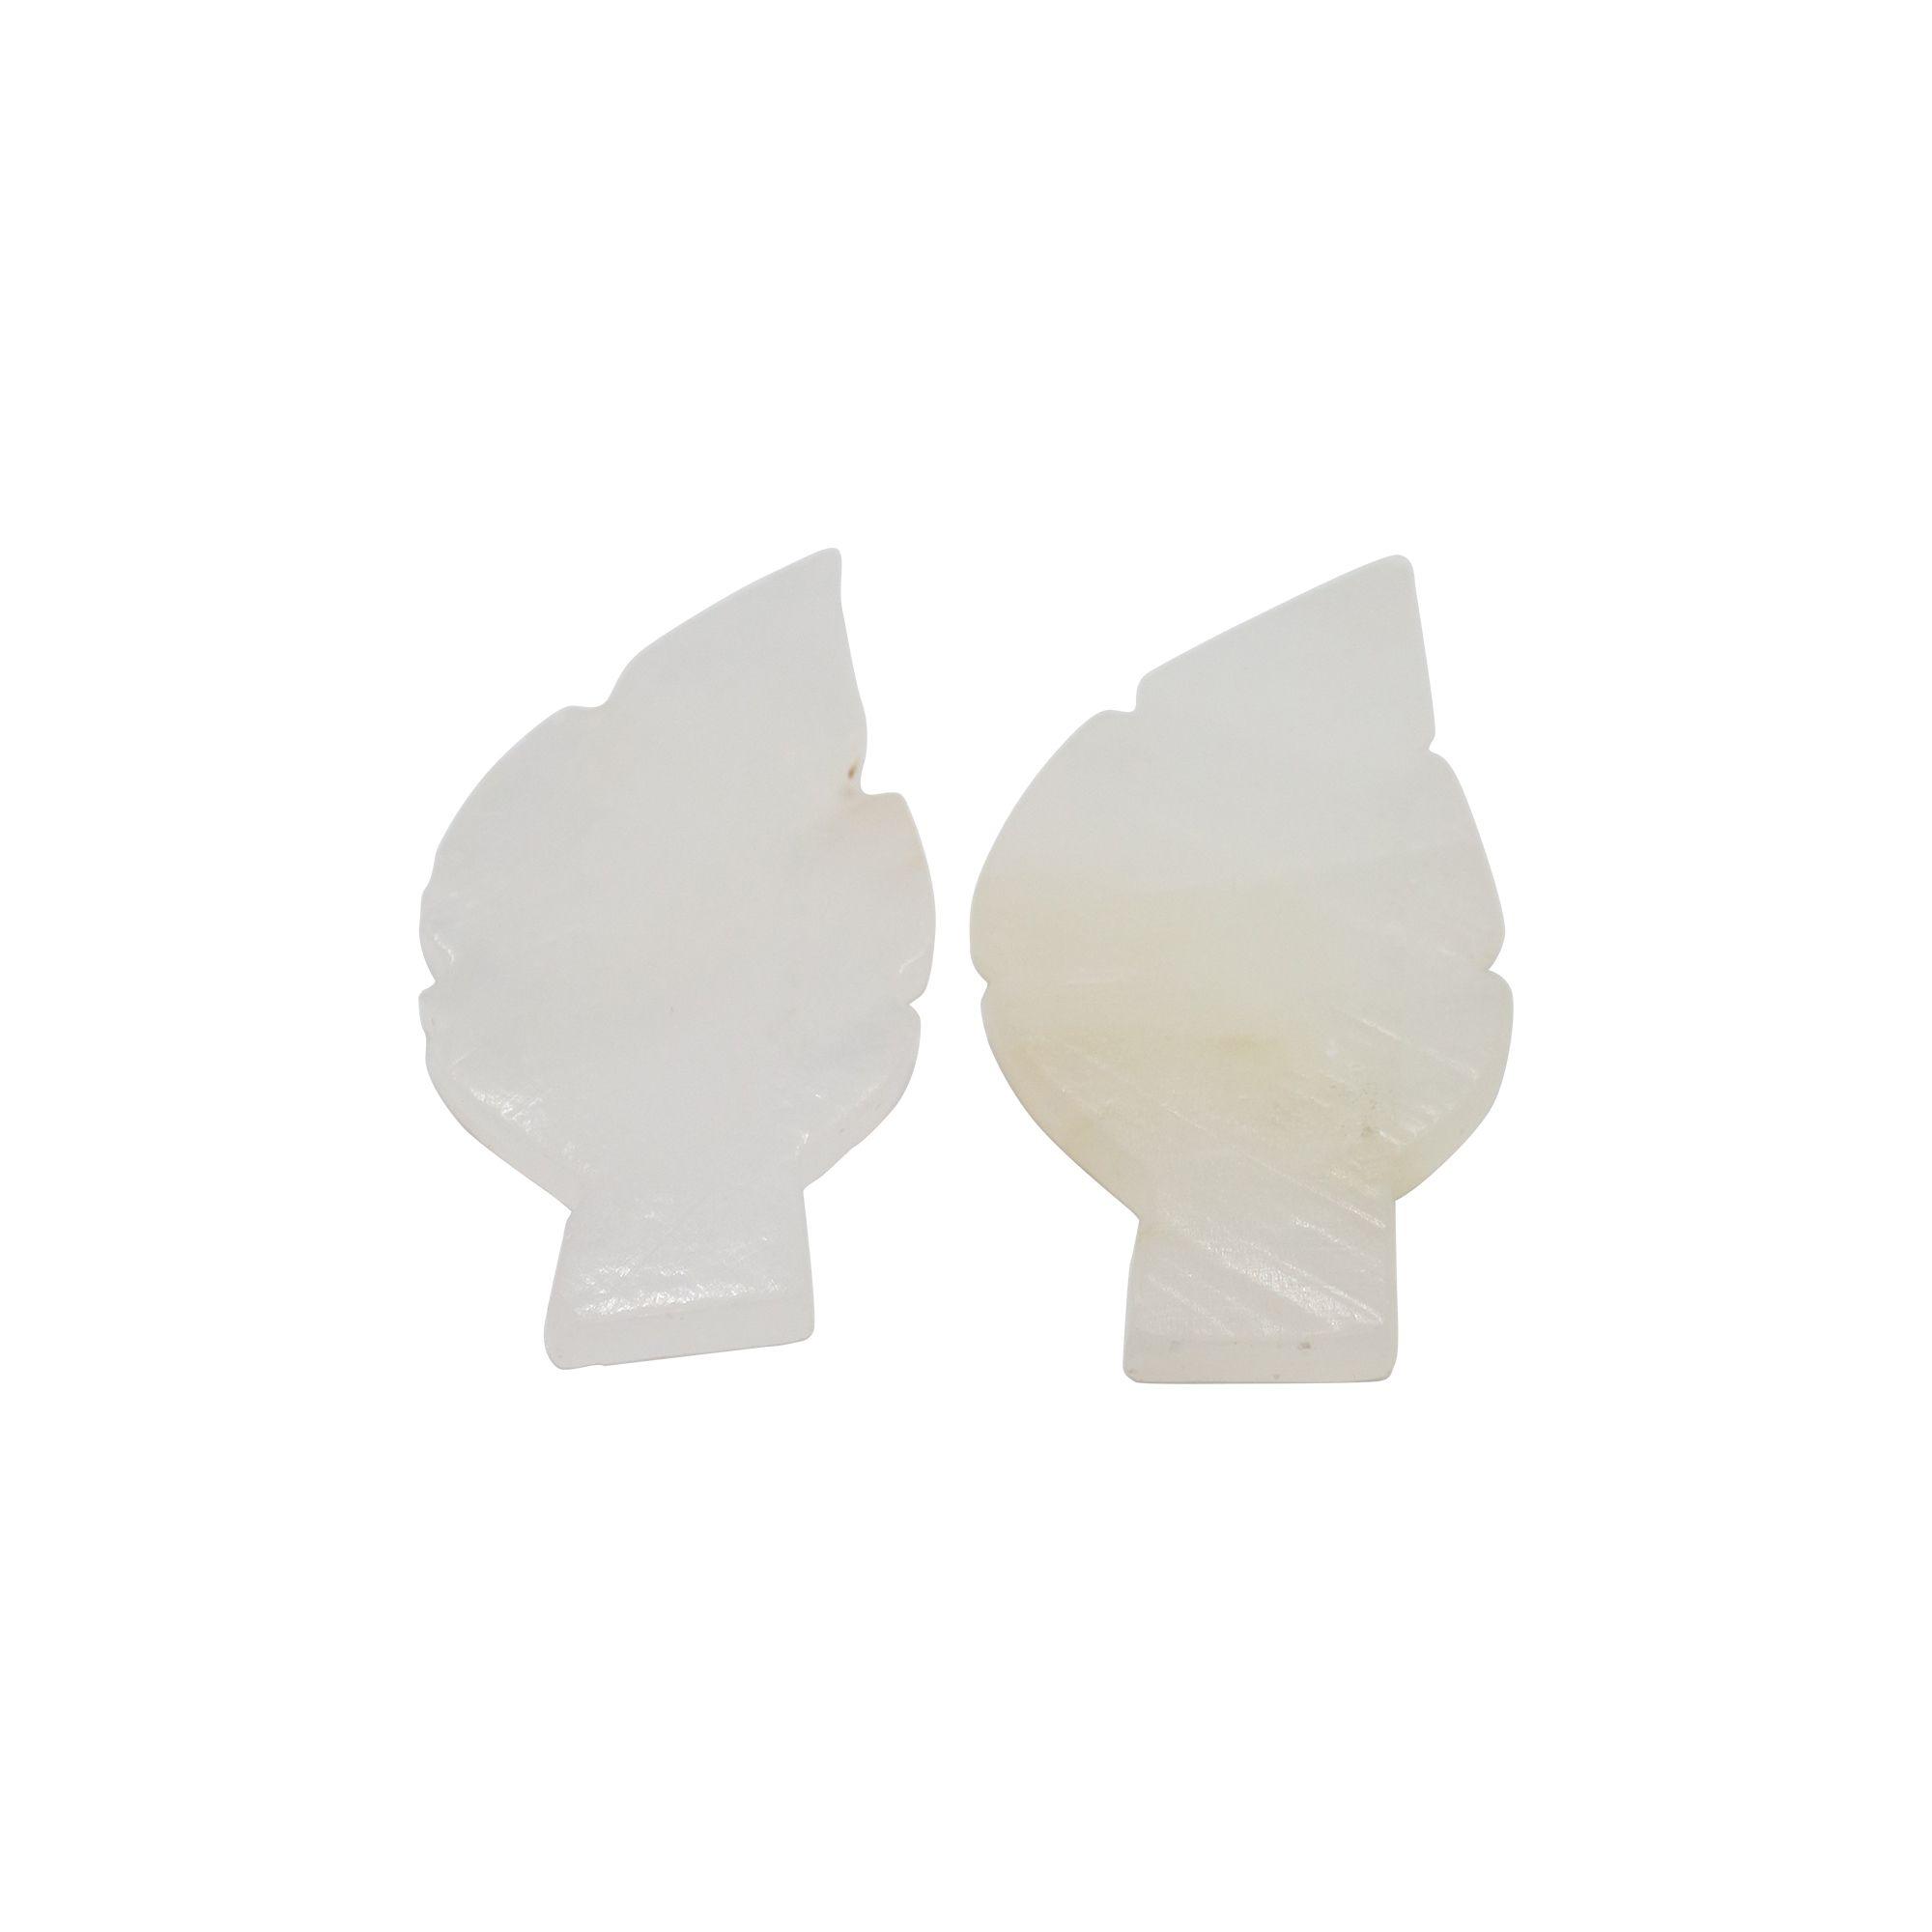 Pedra Quartzo branca em forma de folha 10g - semi lapidada